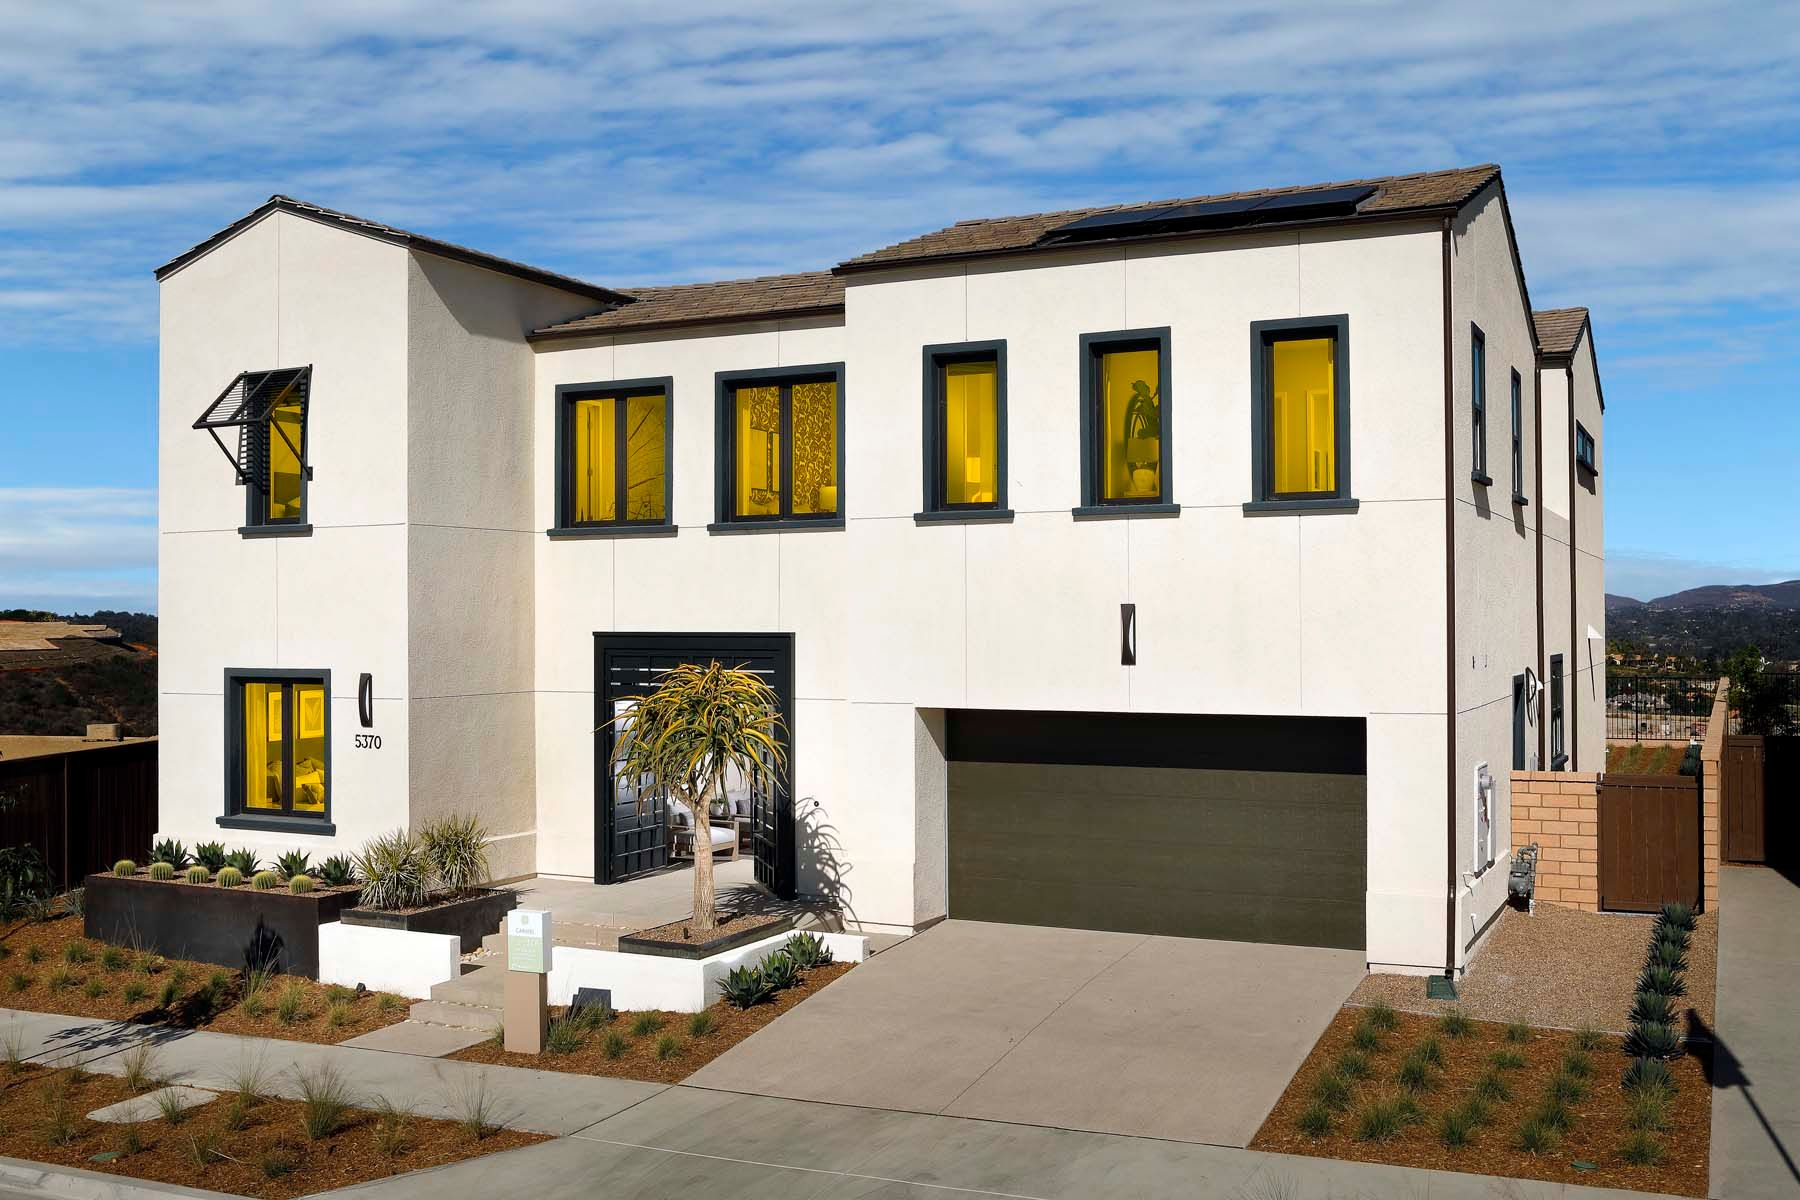 PDH-residence-PRD-Carmel3c-ExtR:Carmel - Plan 3 - Front Exterior